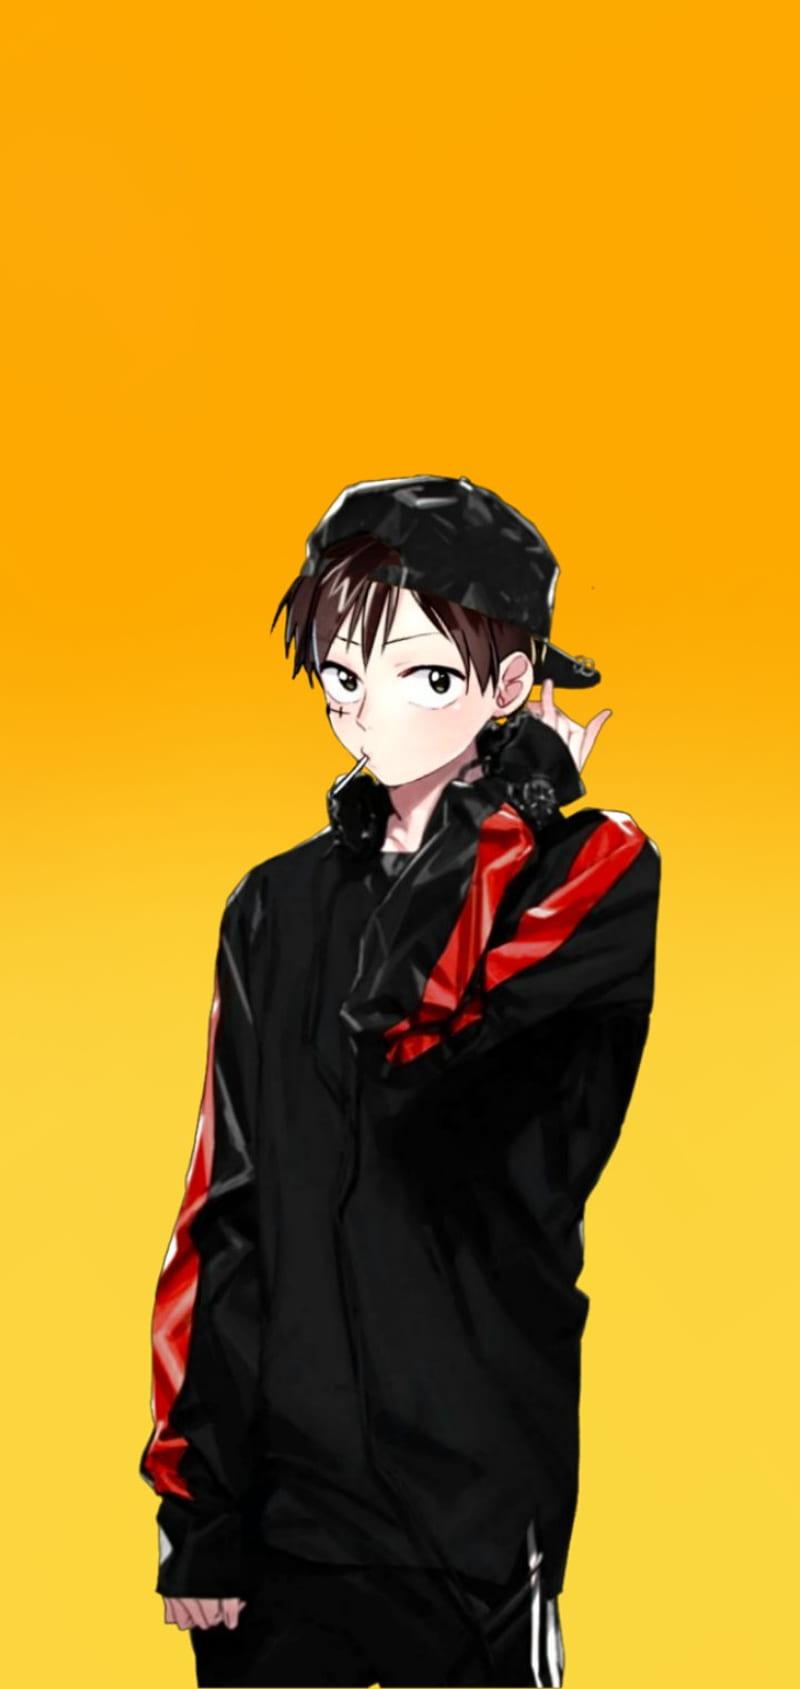 Bad Boy Anime Bad Boy Girl Hd Mobile Wallpaper Peakpx